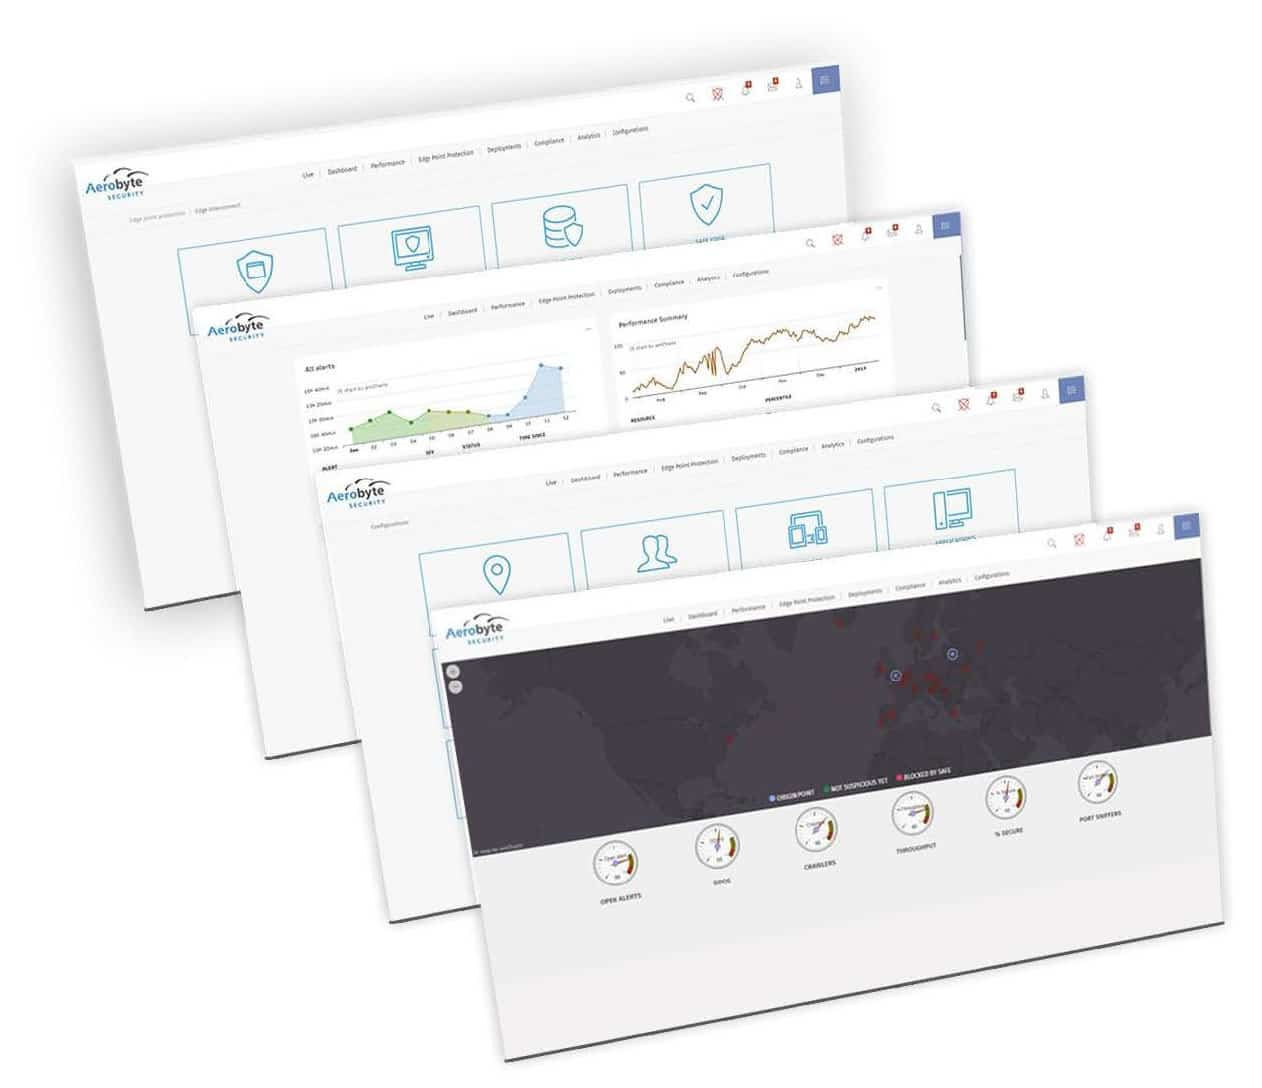 Aerobyte Software Defined Perimeter Dashboard